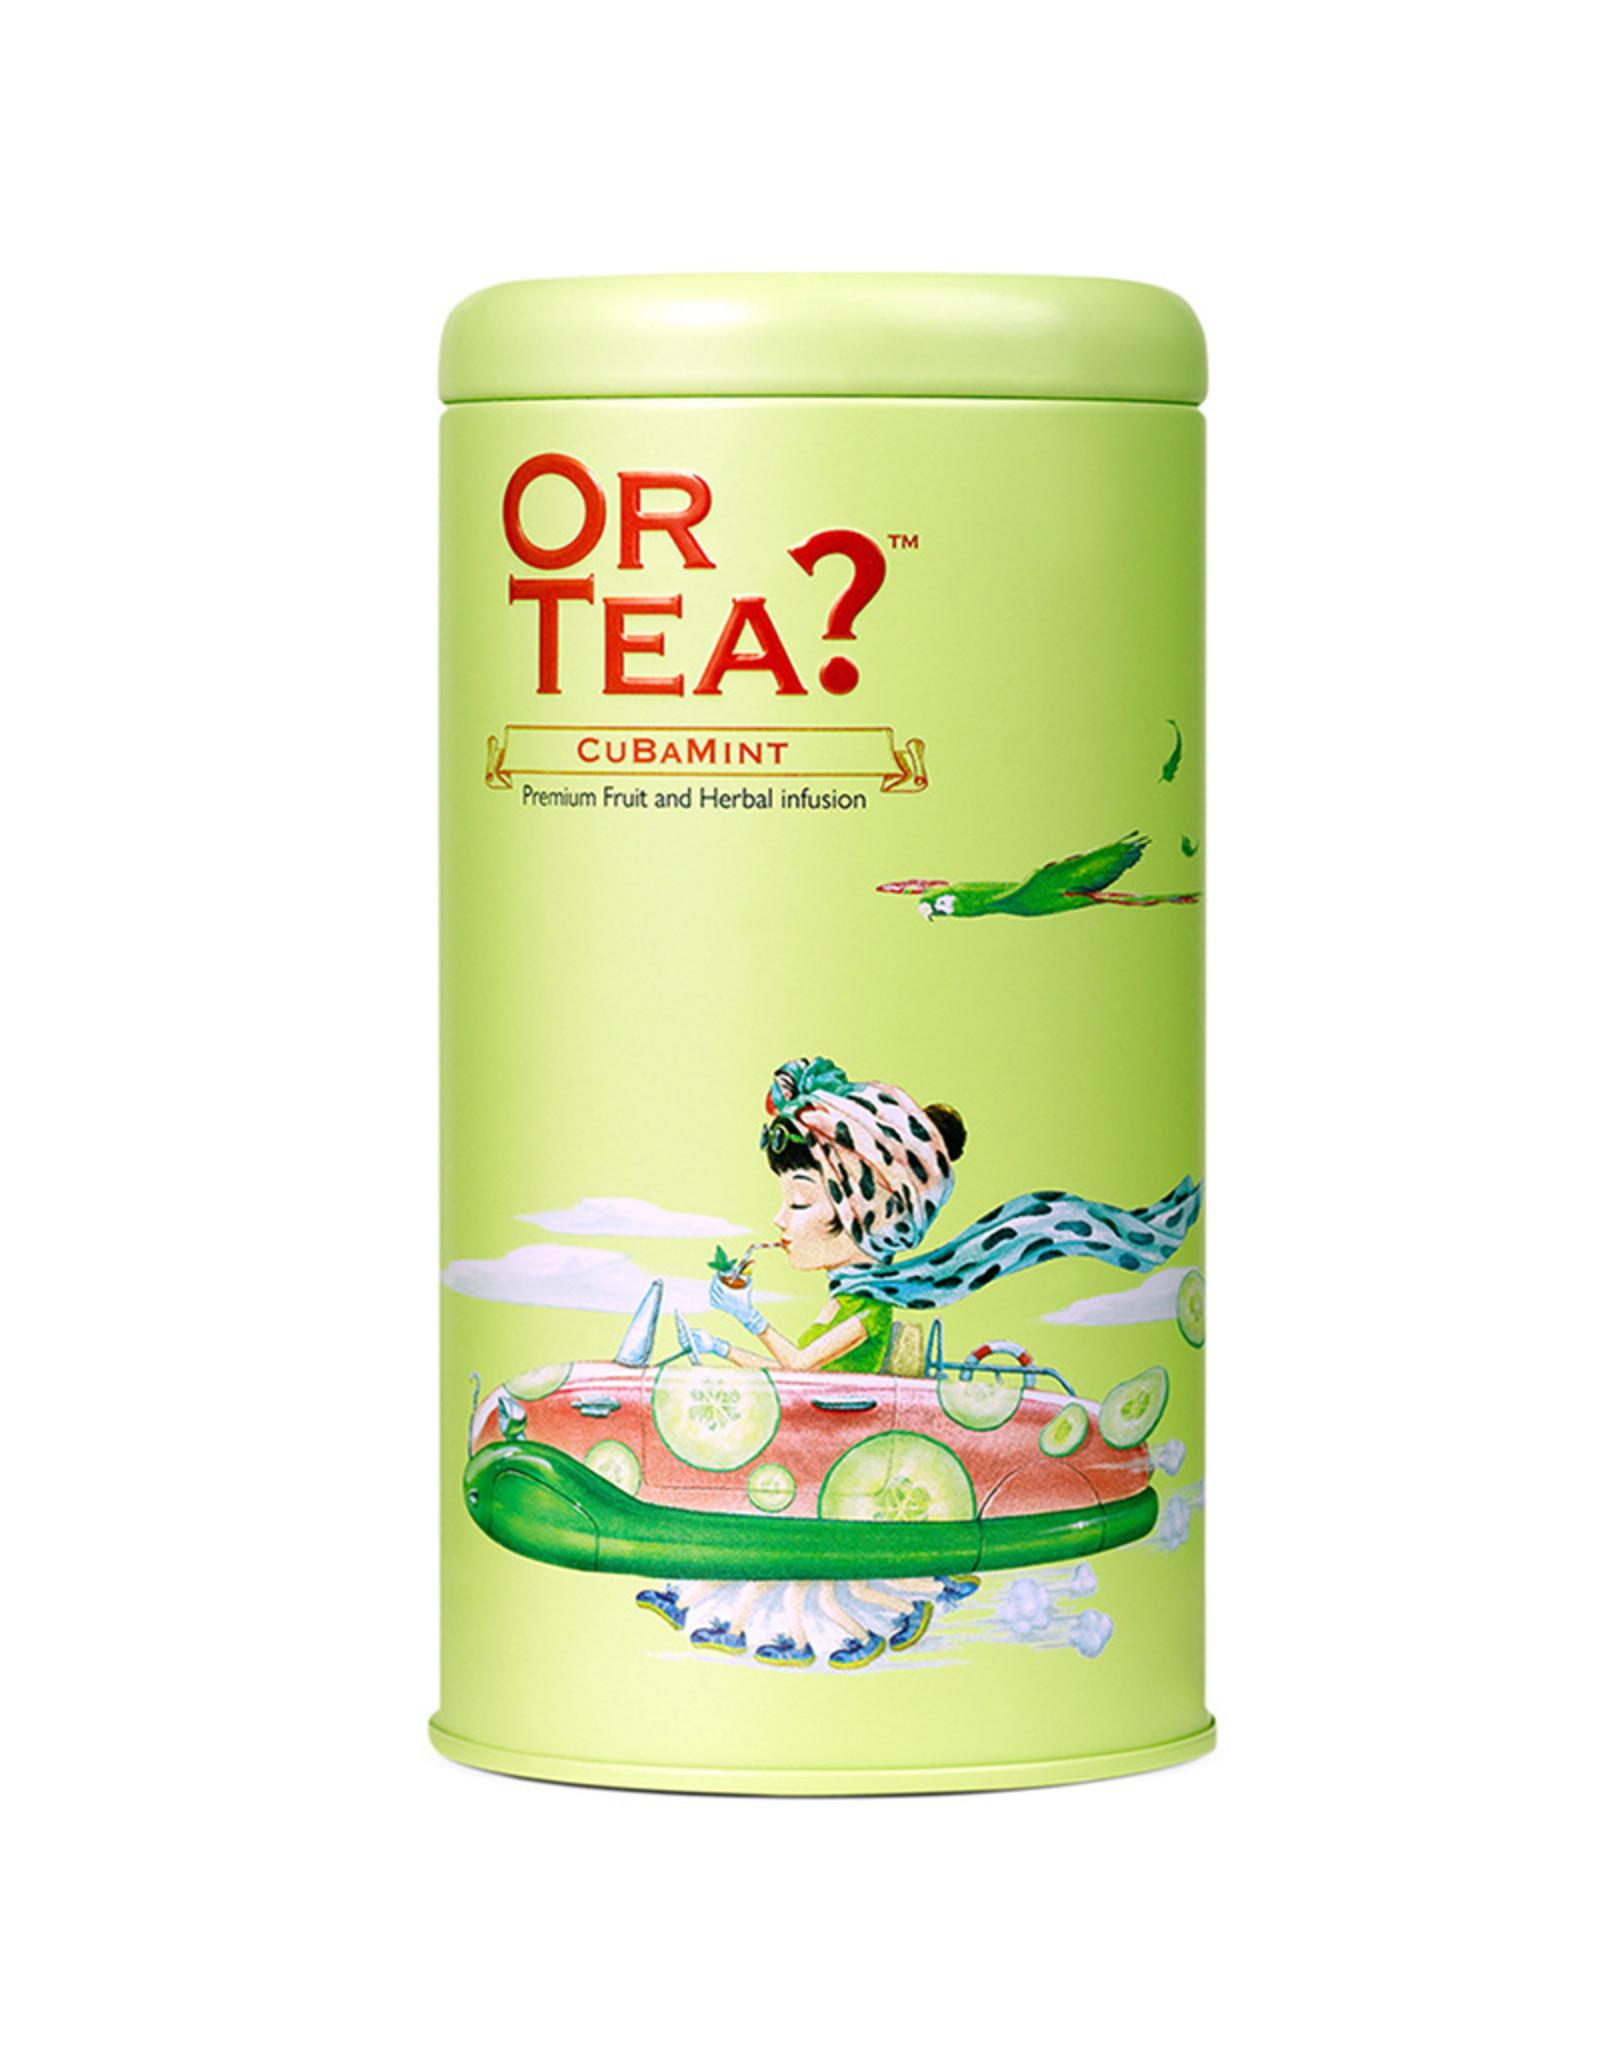 Or Tea? CuBaMint - Infusie van komkommer, basilicum en munt